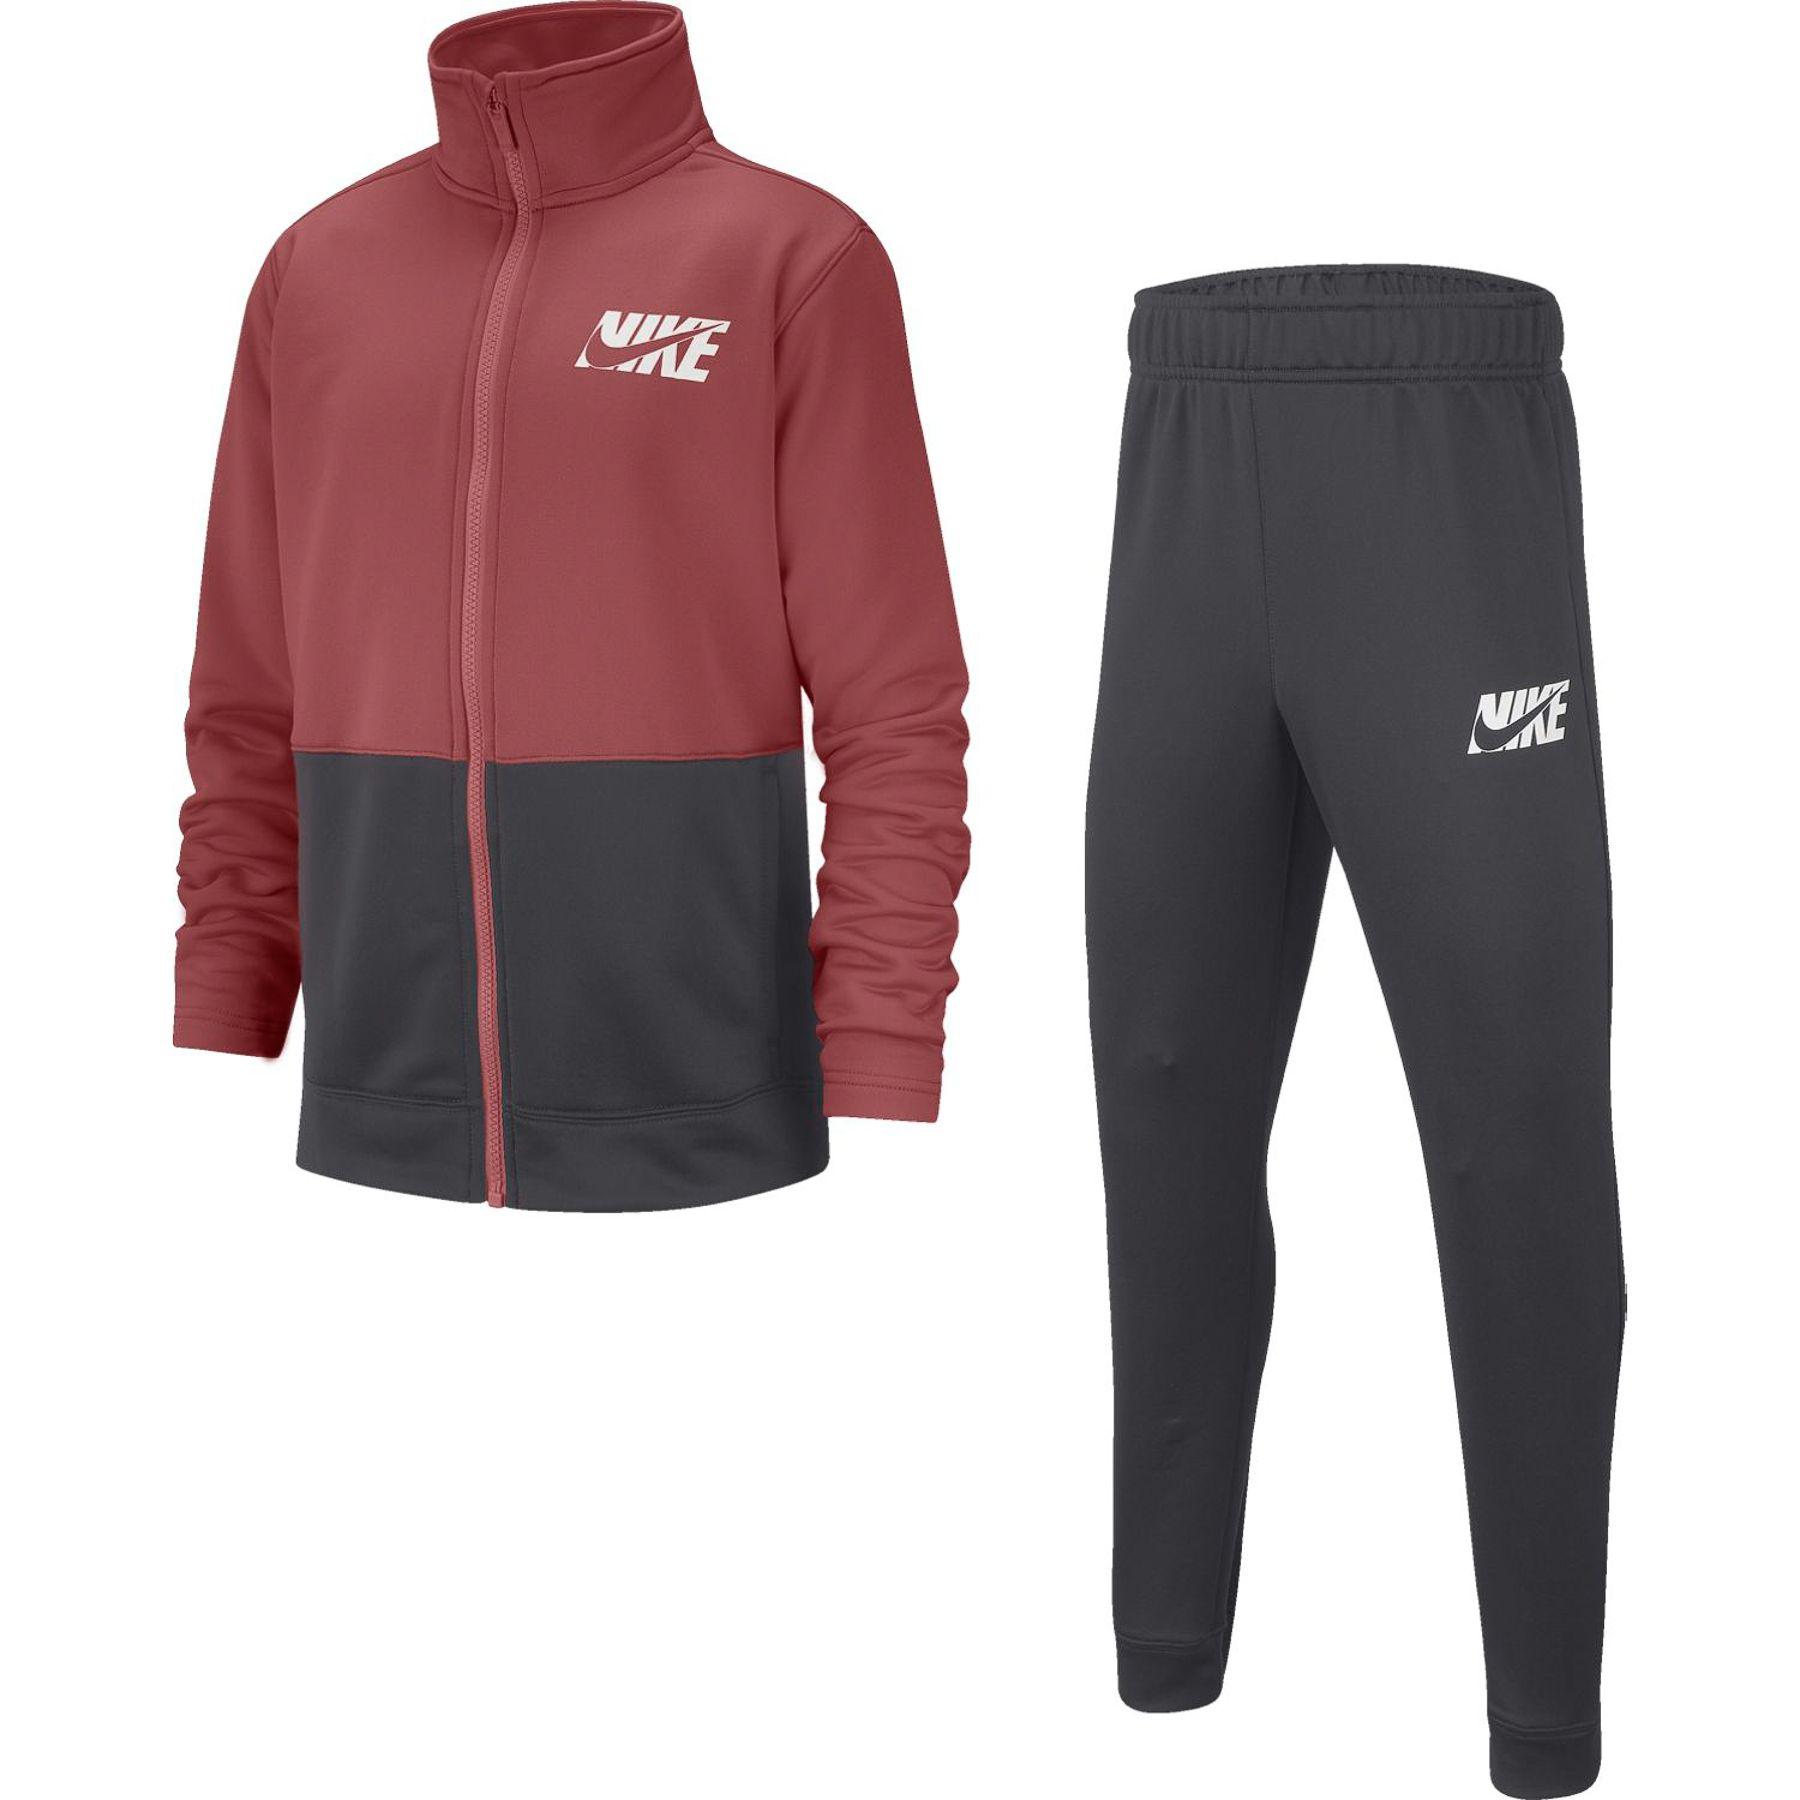 Nike fiú melegítő SPORTSWEAR | Markasbolt.hu Hivatalos NIKE